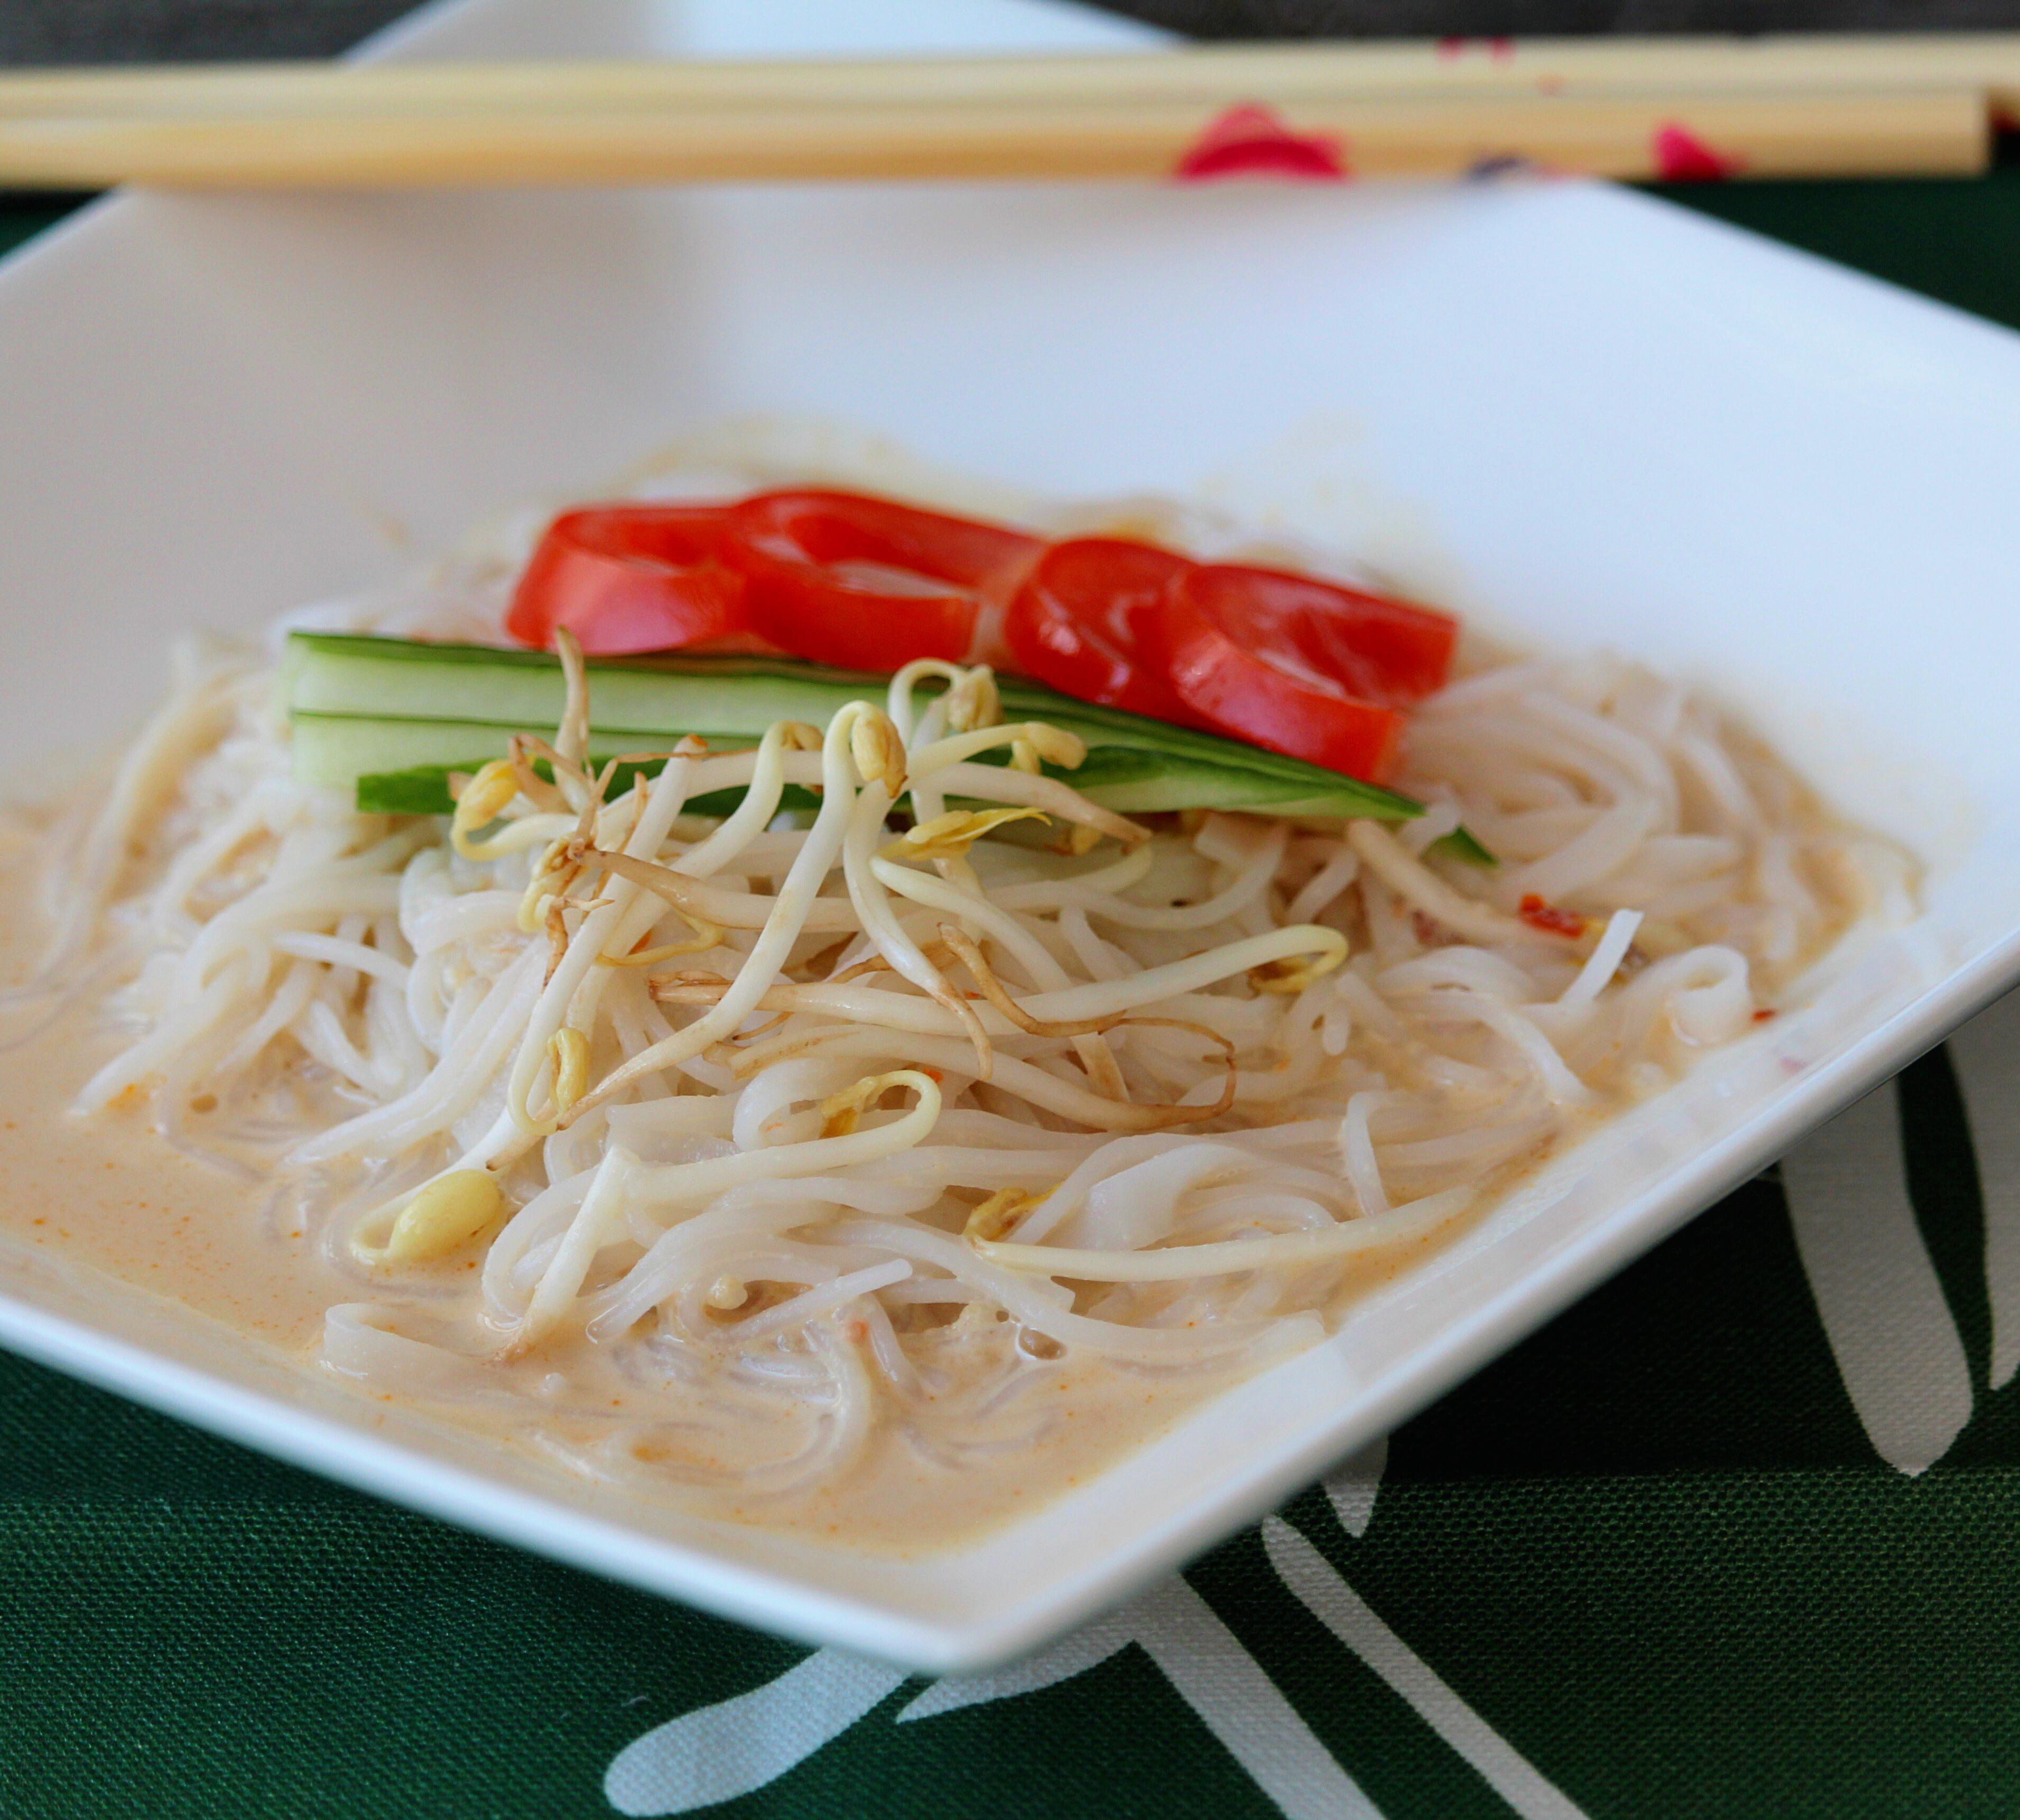 Korean Soybean Noodles (Kong Kook Su)